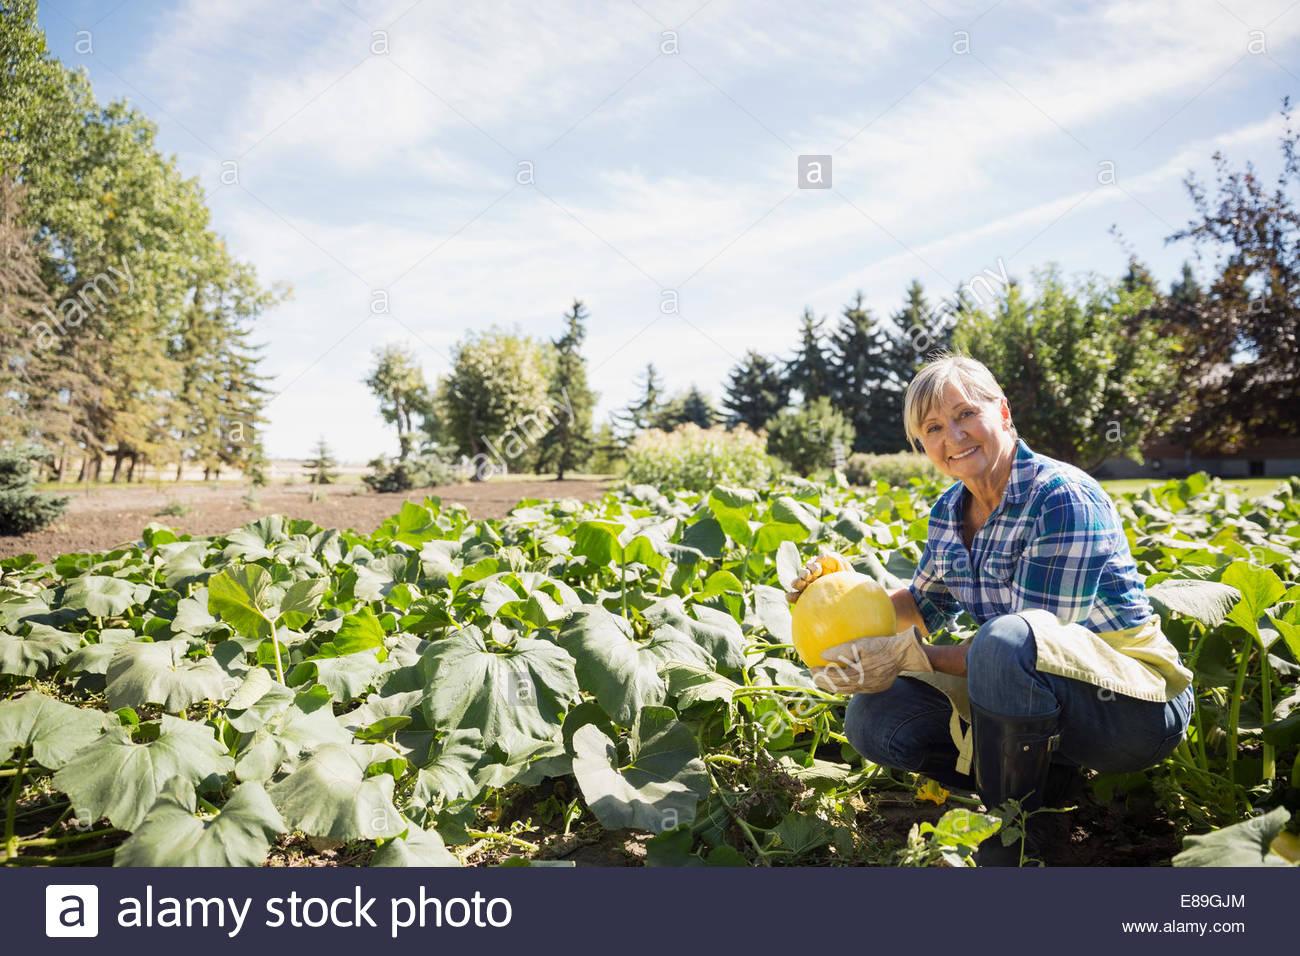 Portrait of woman harvesting squash in vegetable garden Photo Stock